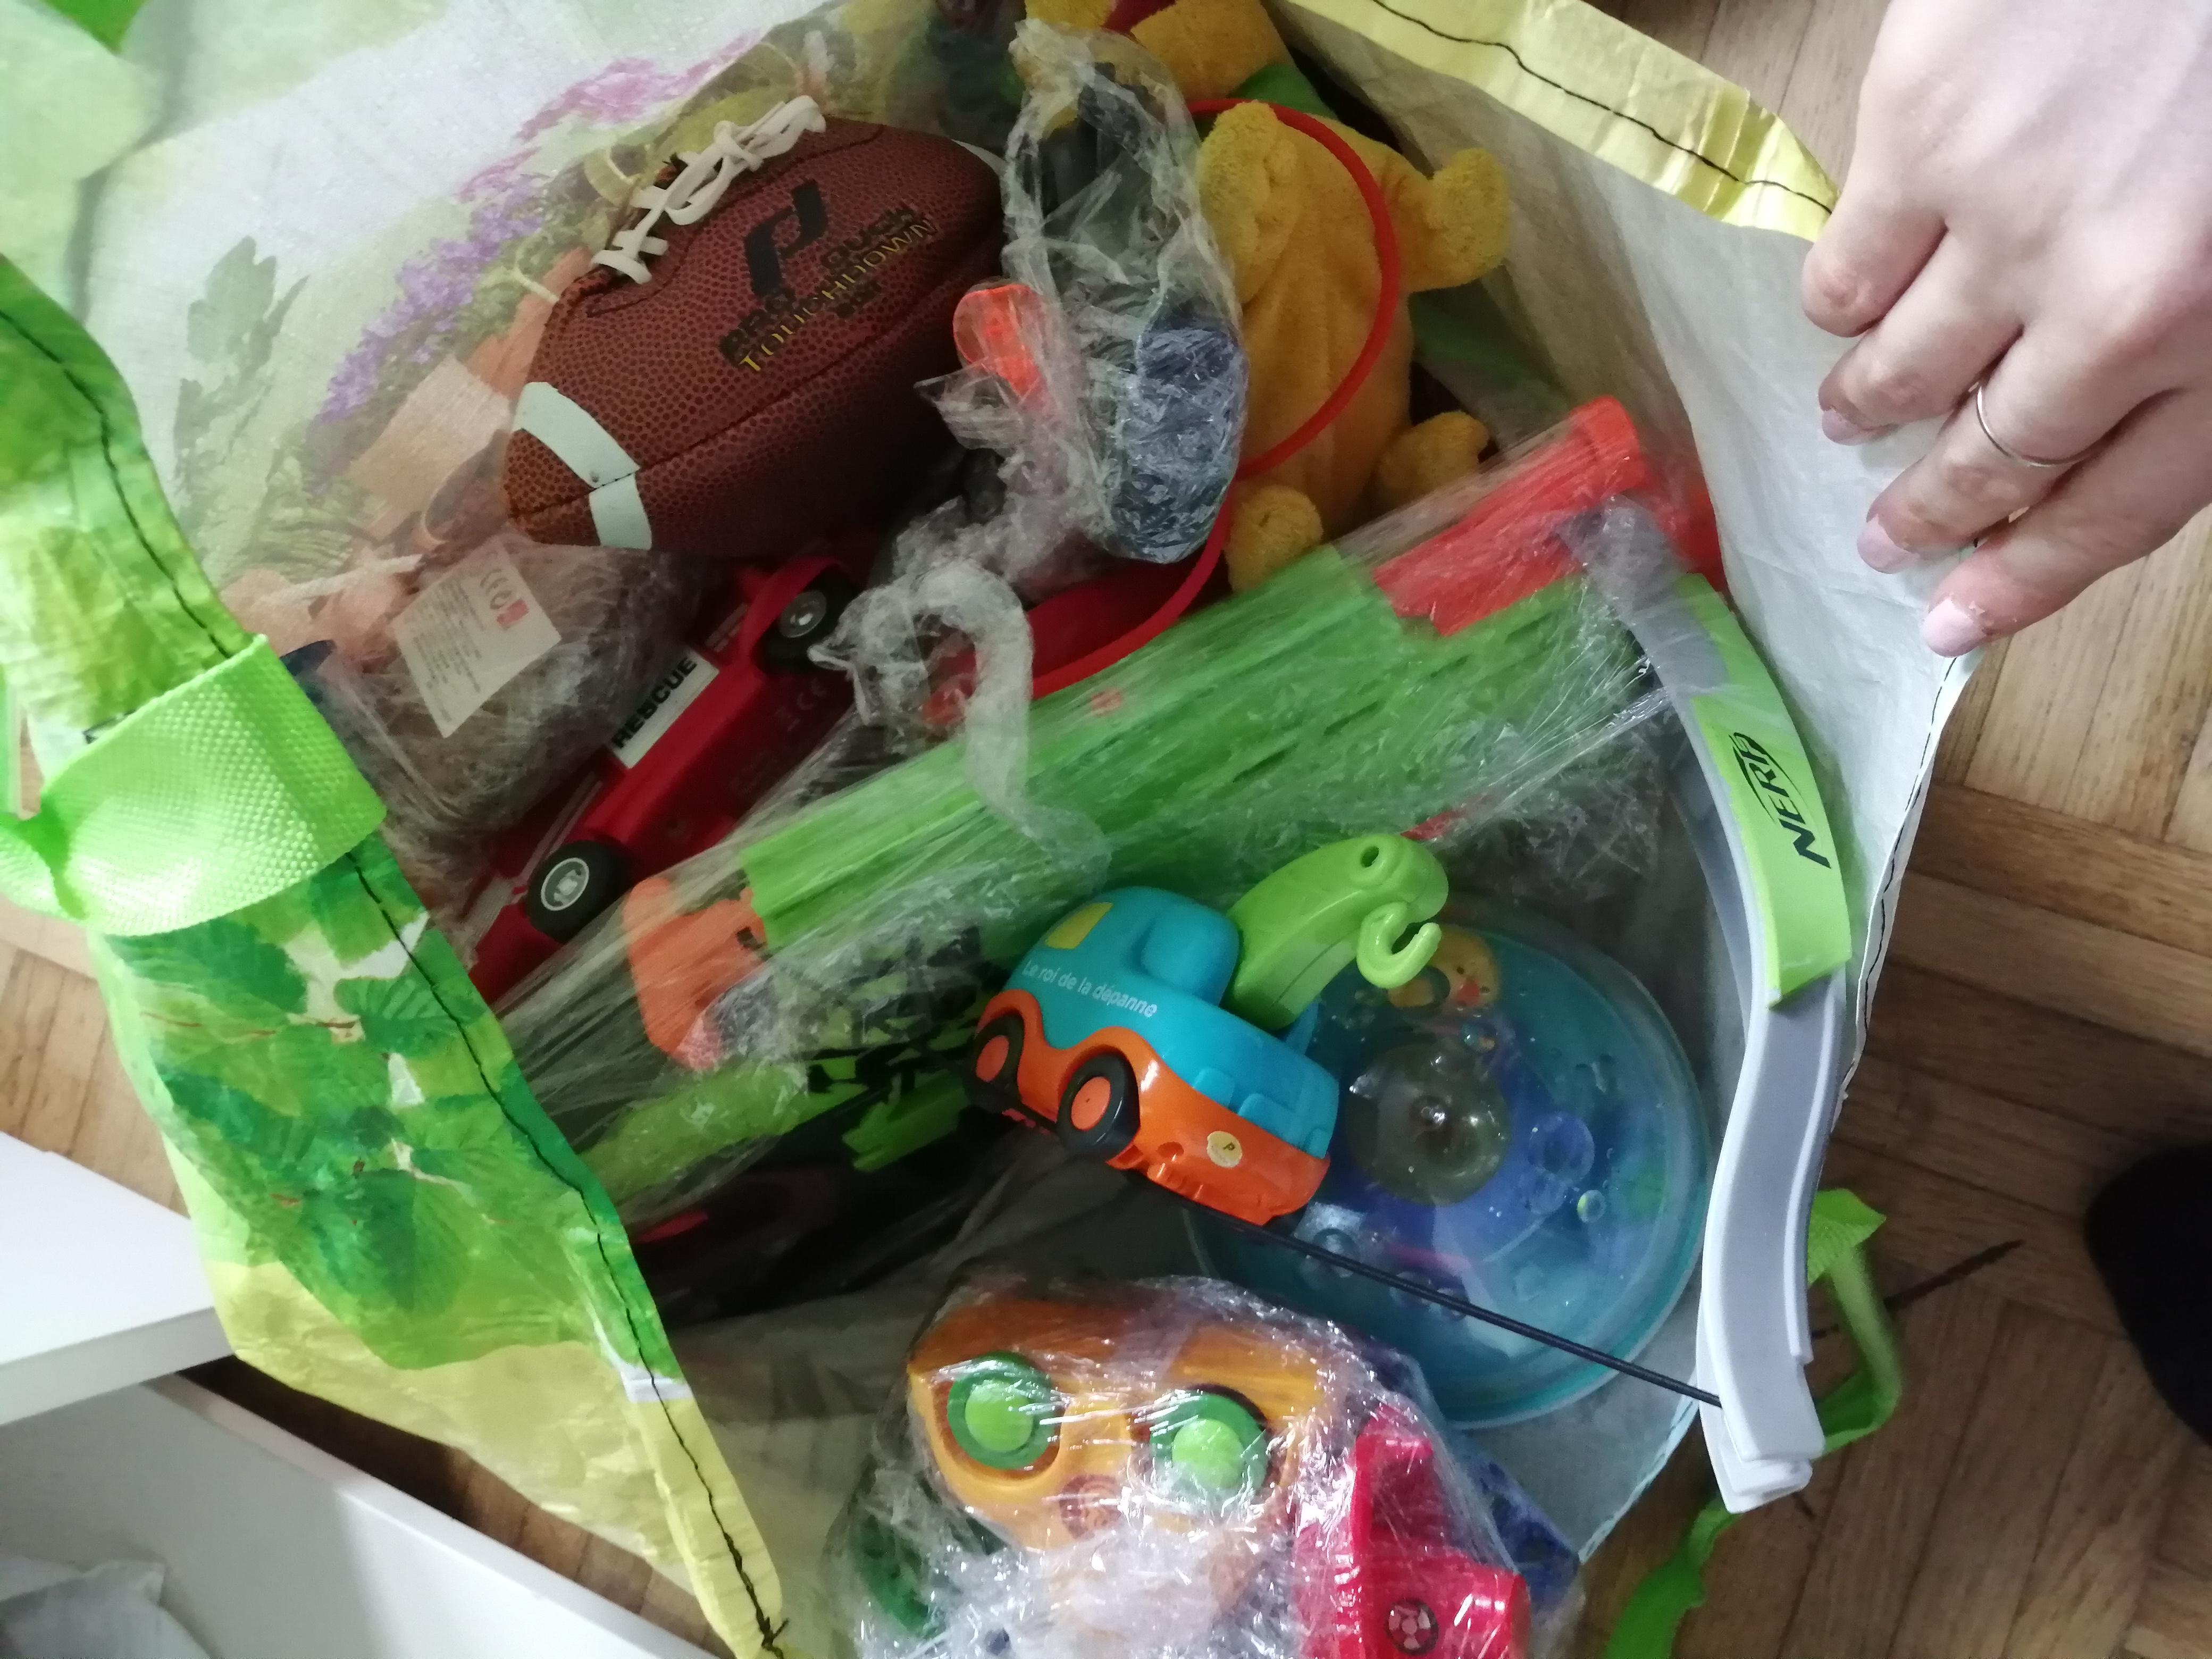 troc de troc sac de jouets image 0